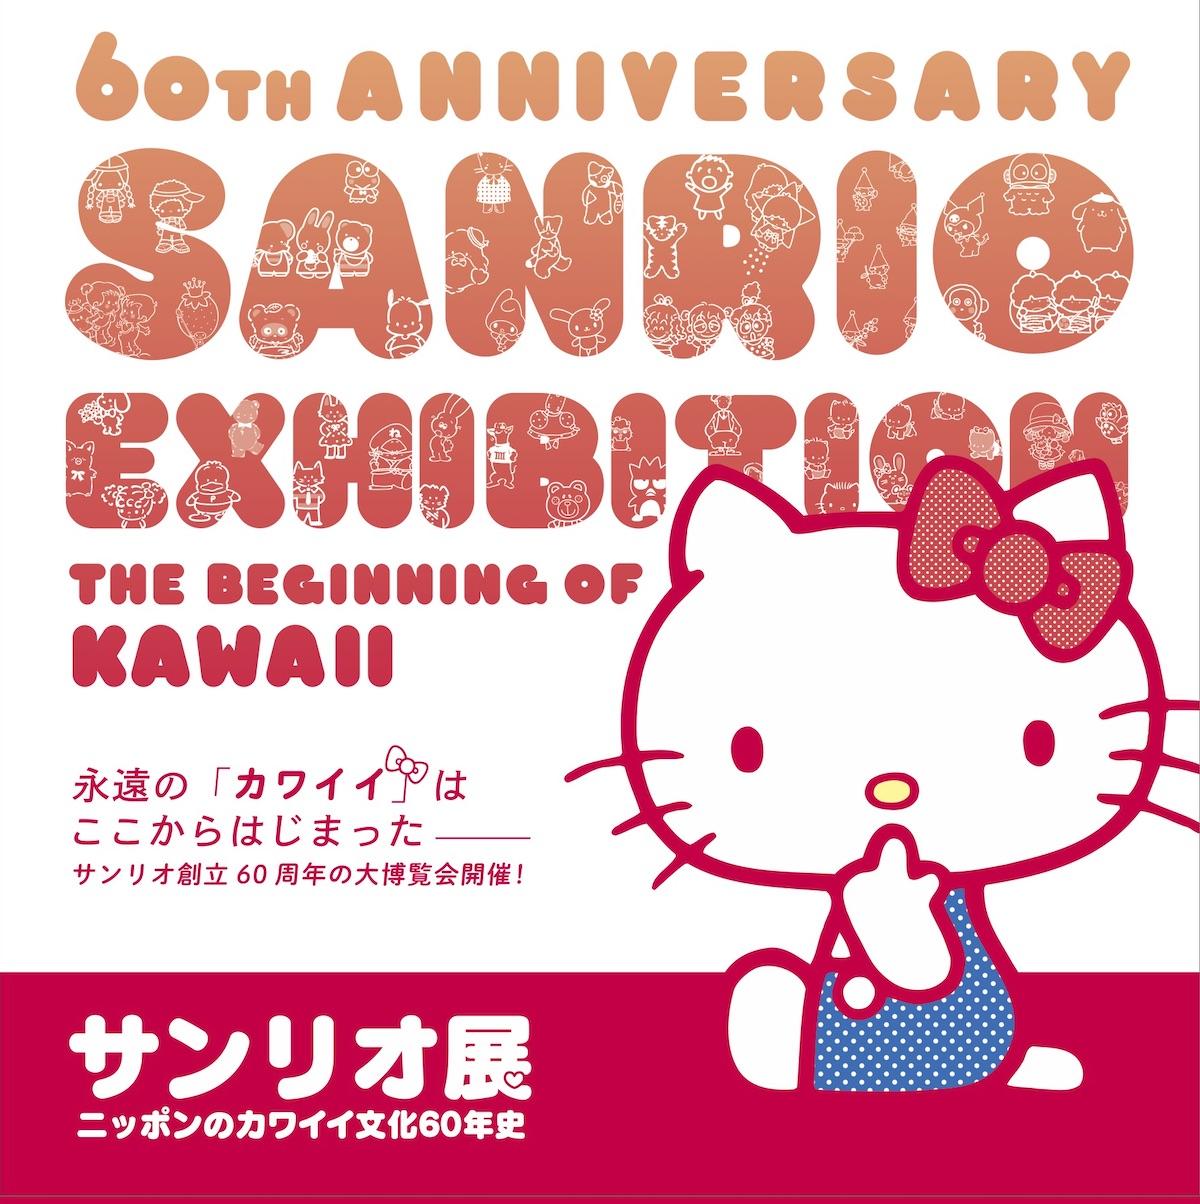 ©️ 2021 SANRIO CO., LTD. APPROVAL NO. SP610329